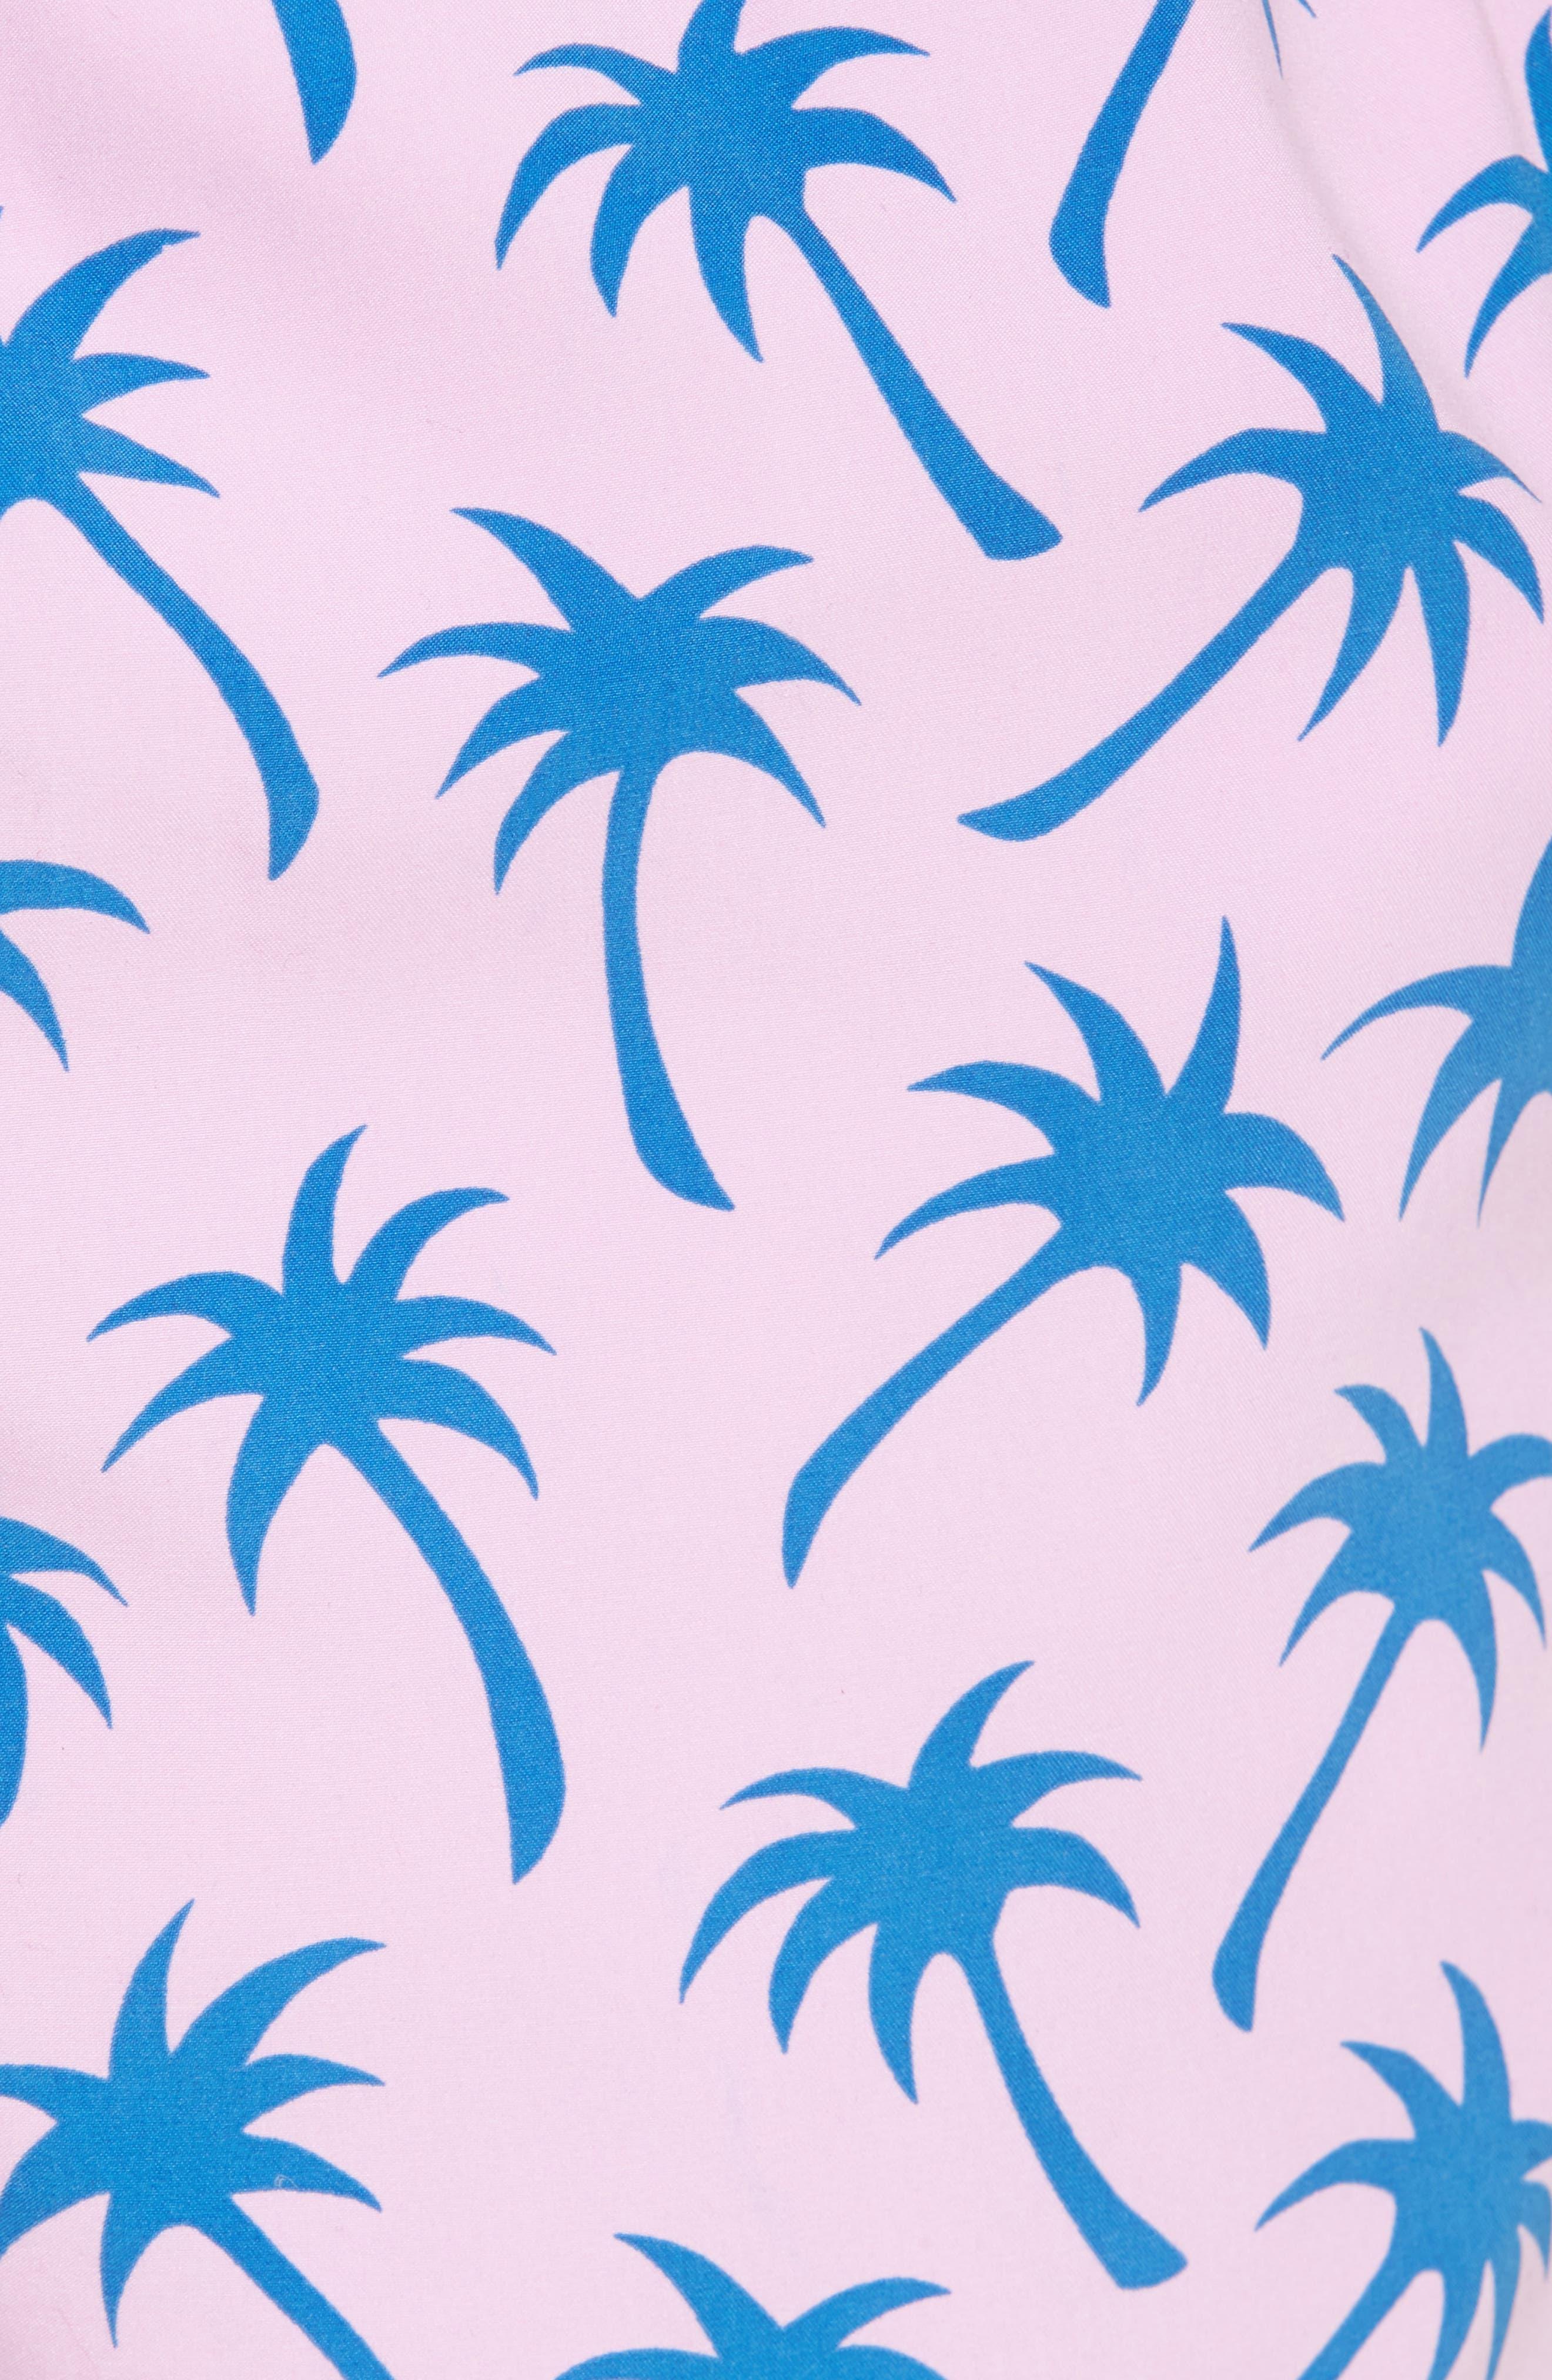 Palm Print Swim Trunks,                             Alternate thumbnail 5, color,                             439